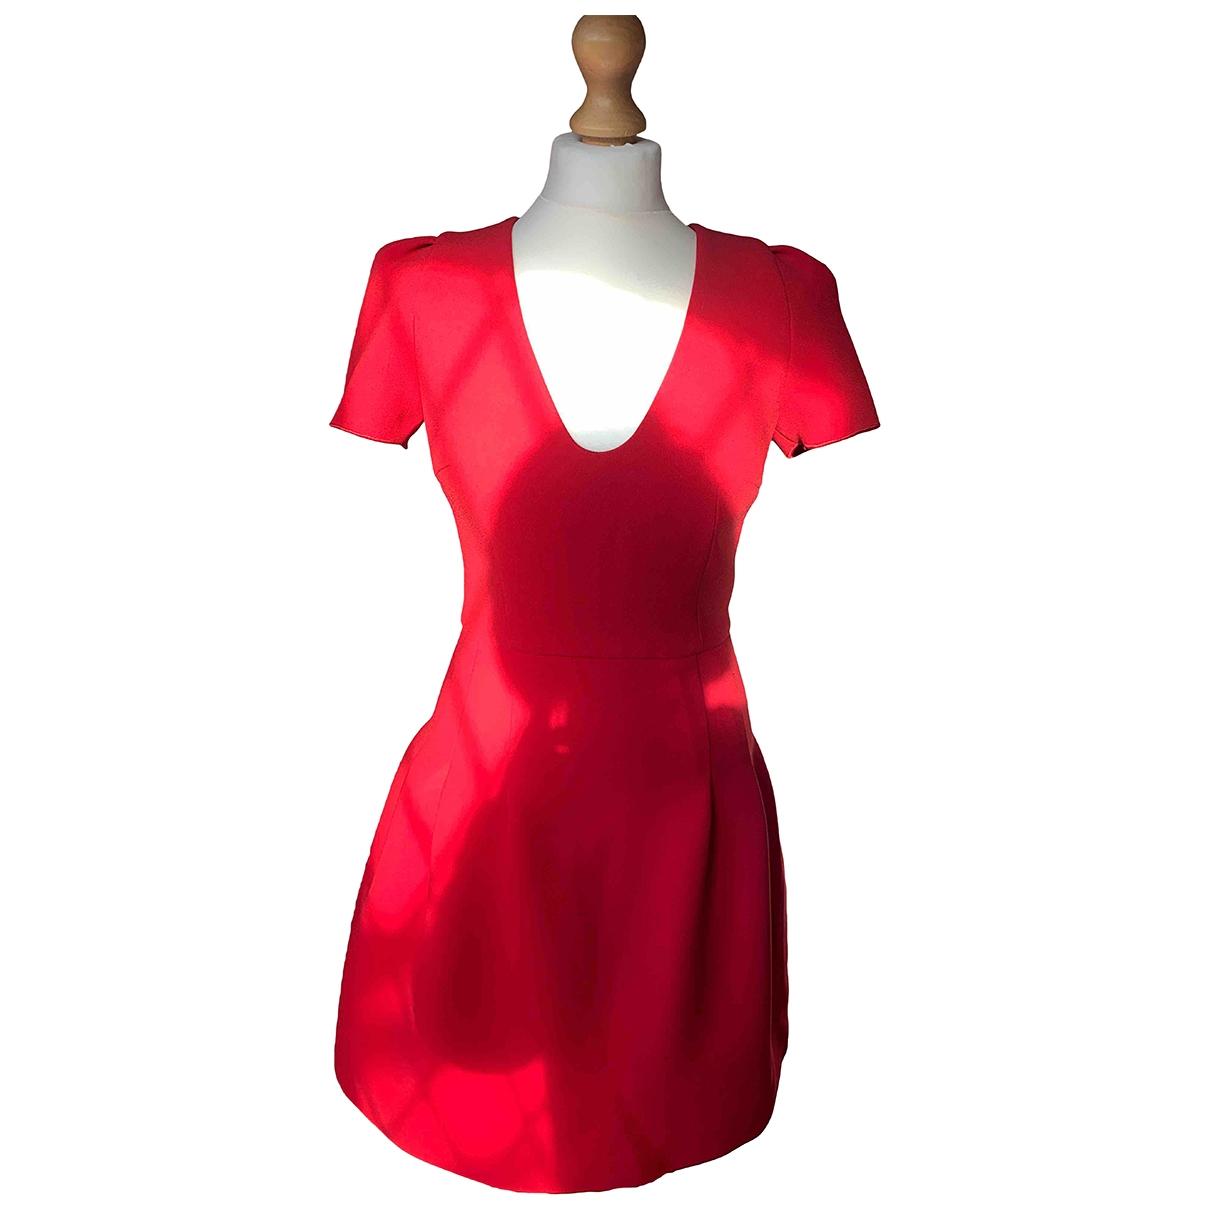 Yeojin Bae \N Red dress for Women 1 0-5